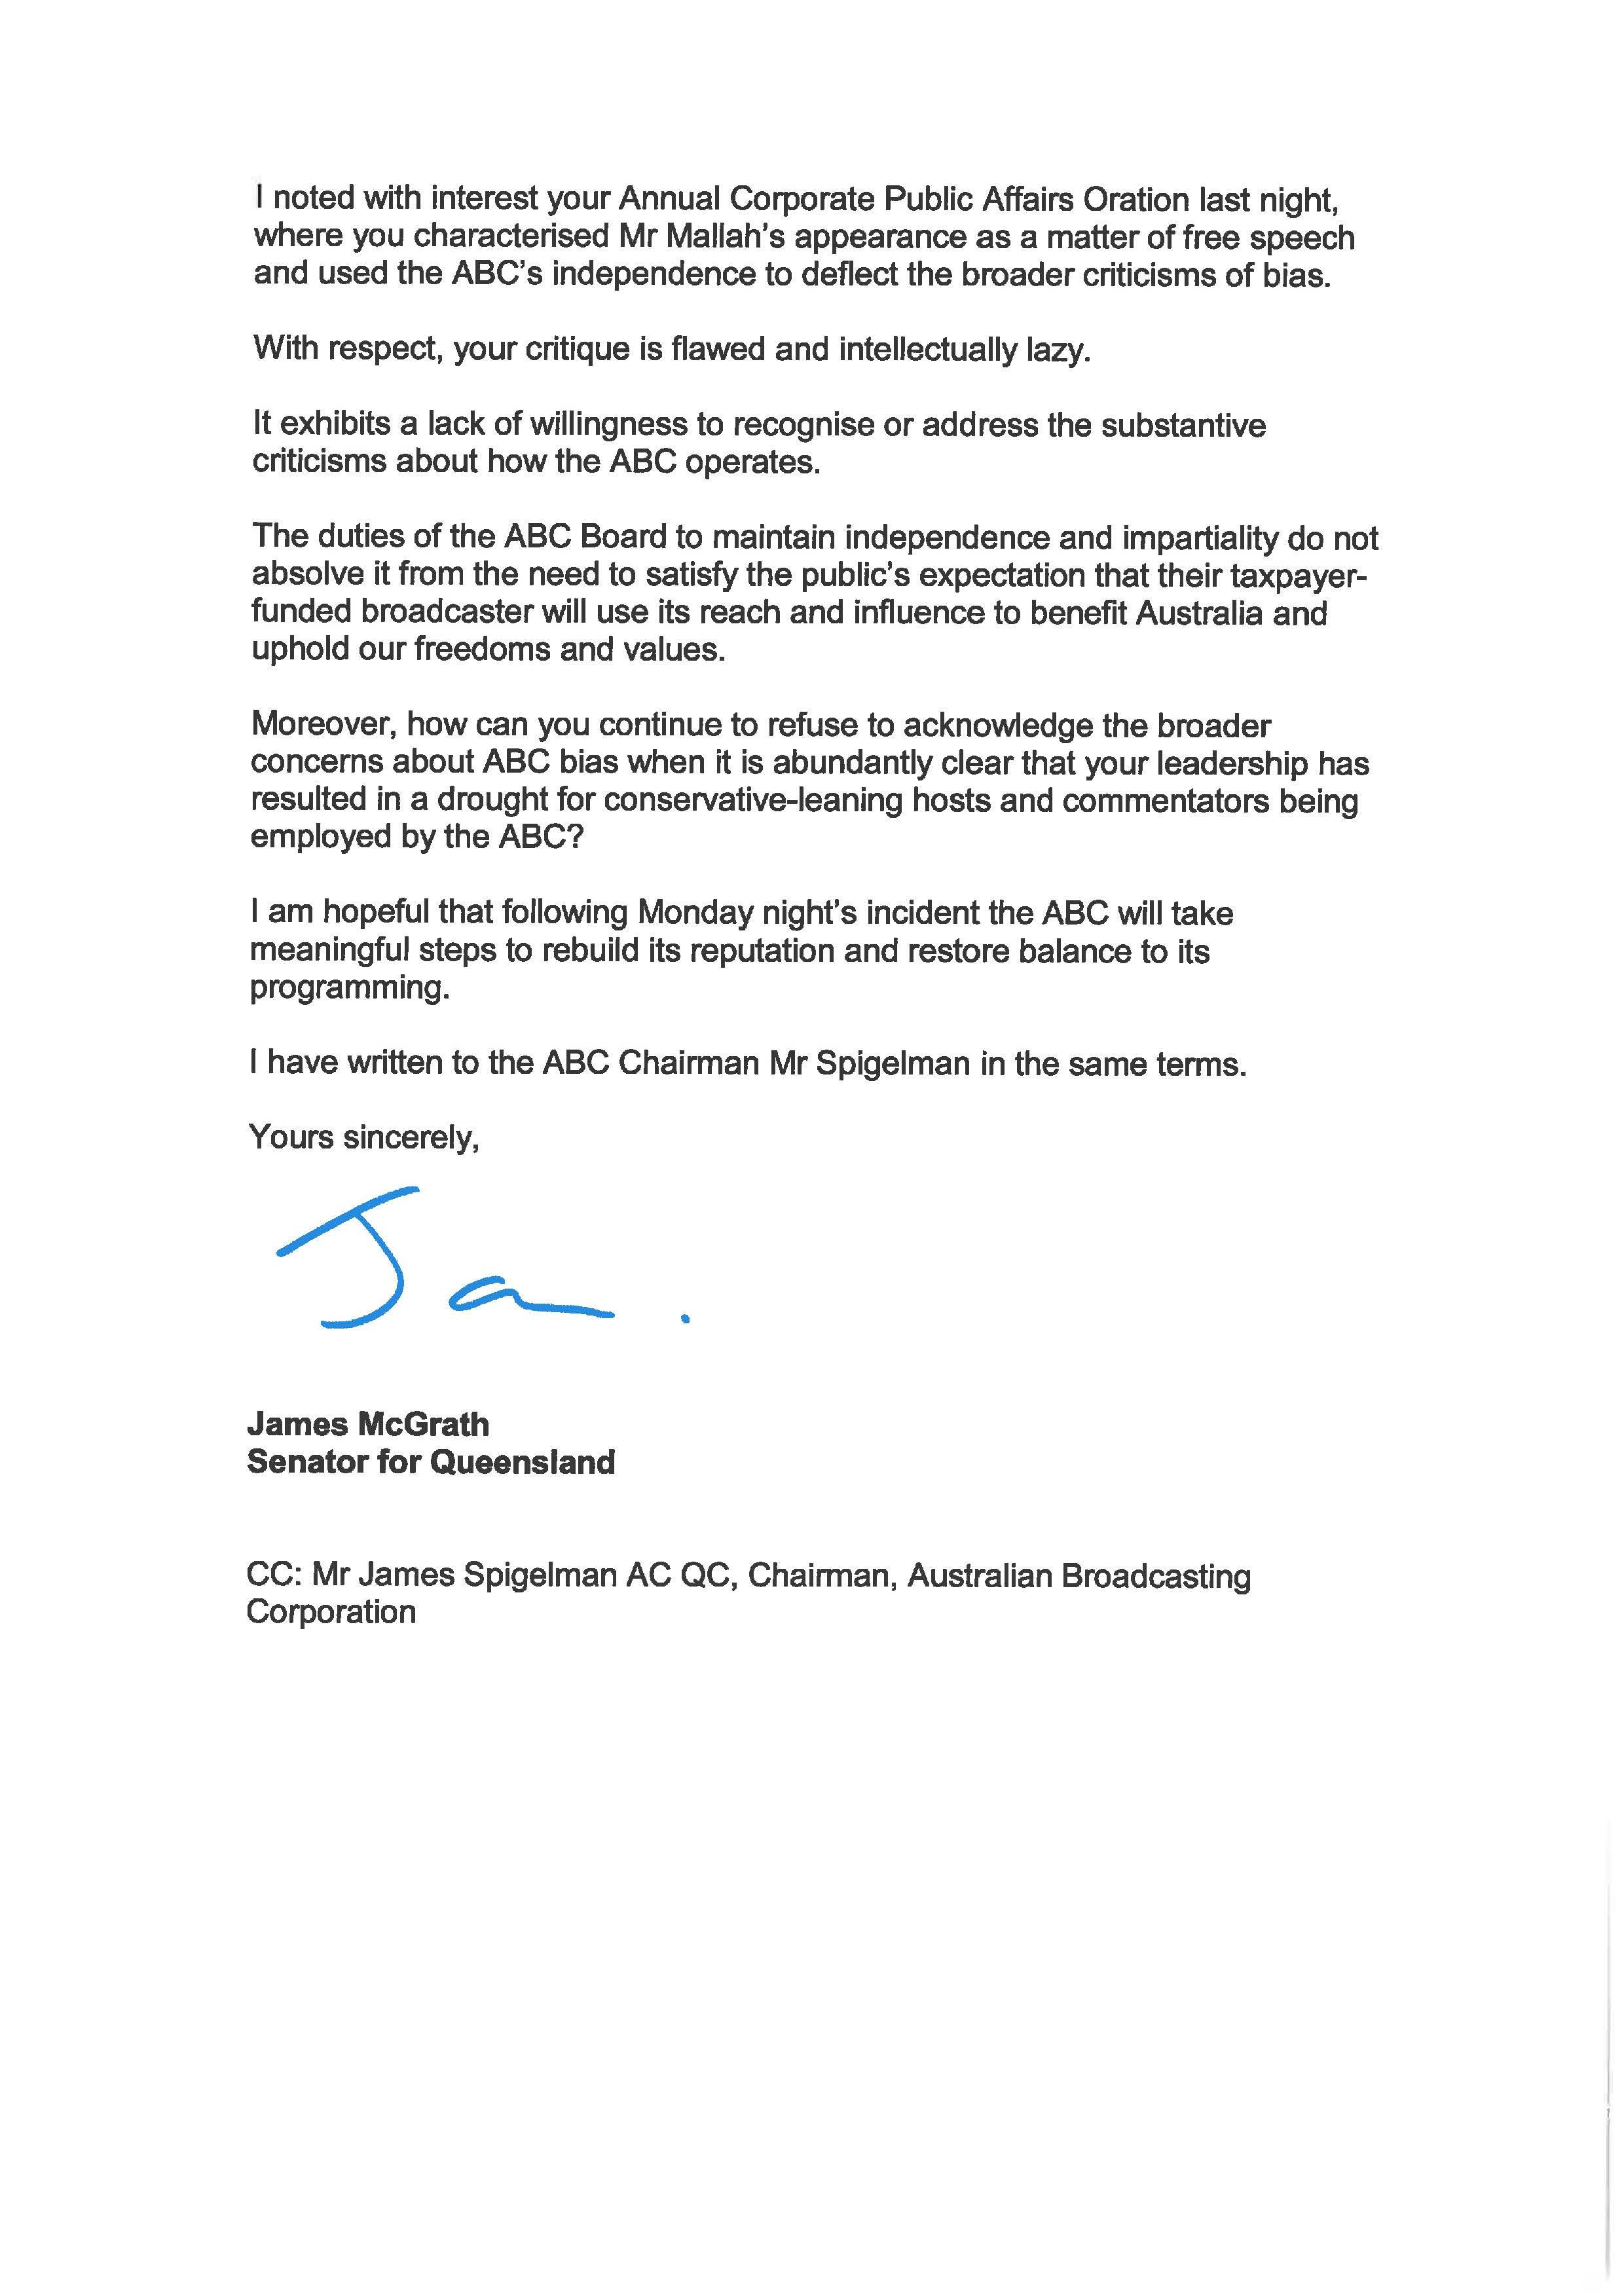 Sen_James_McGrath_letter_to_ABC_MD_Mark_Scott_260615_Page_2.jpg